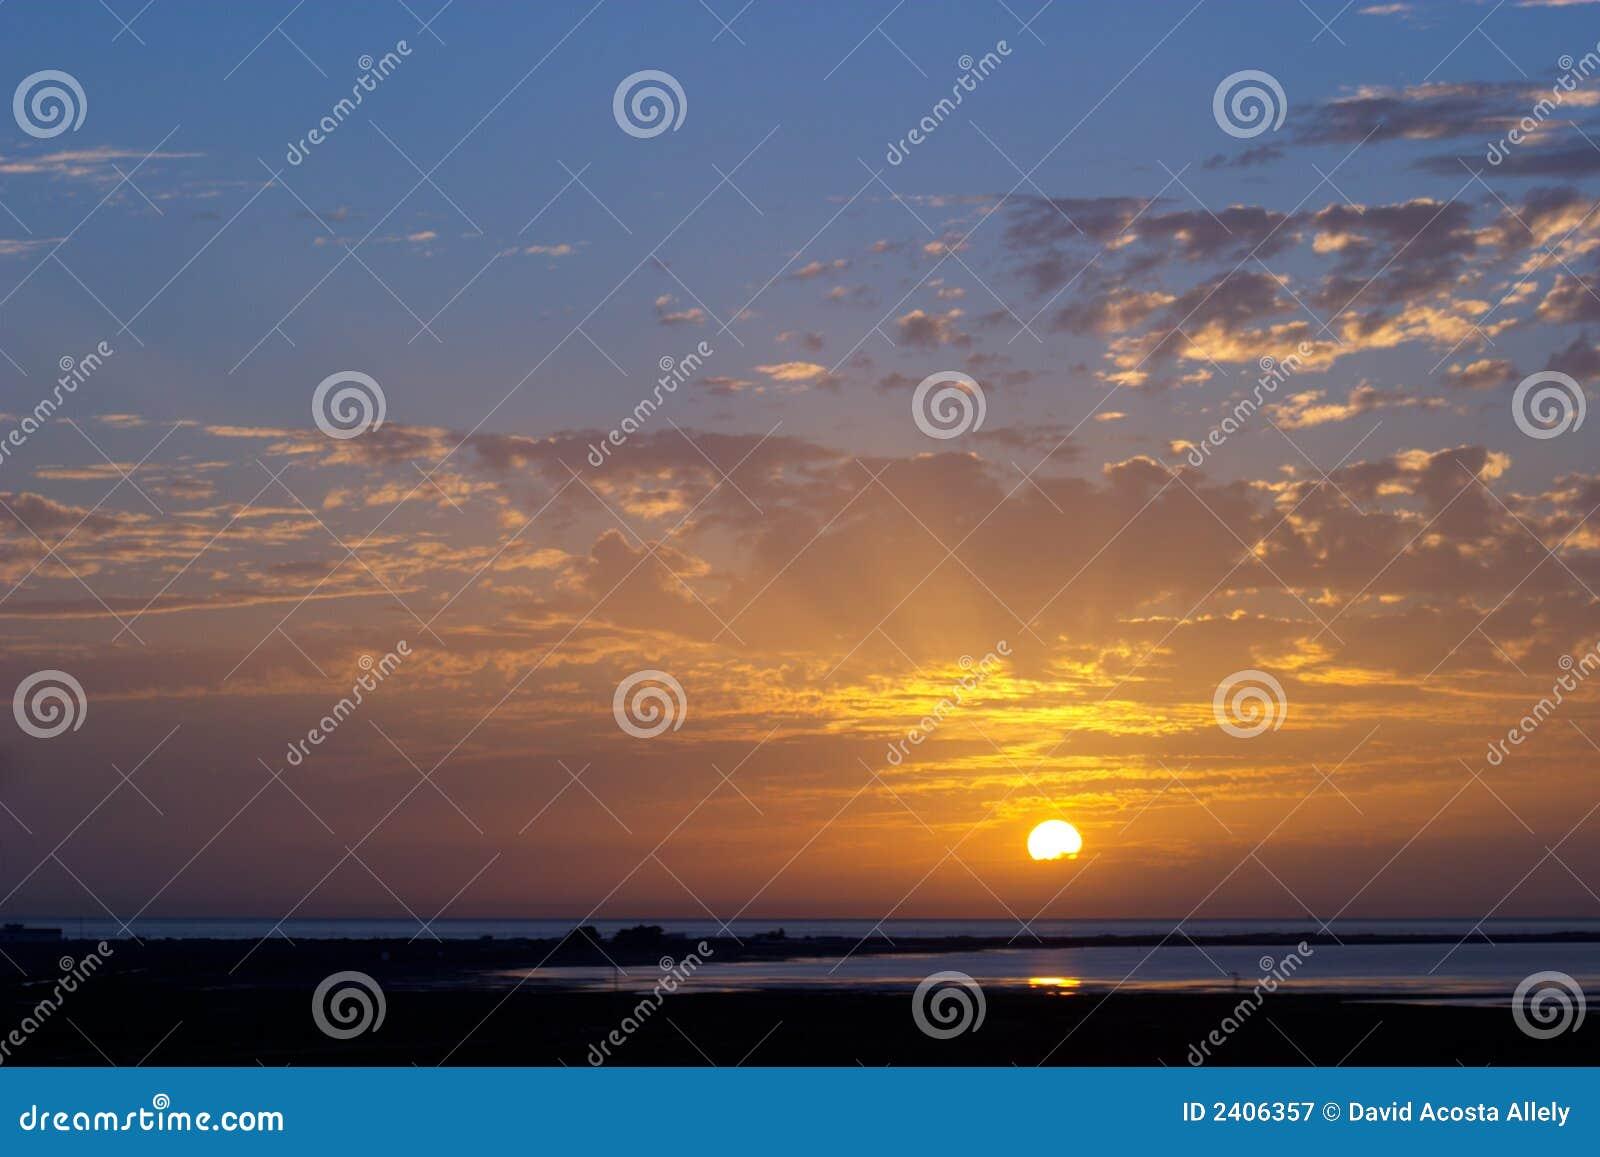 Nasceres do sol e por do sol